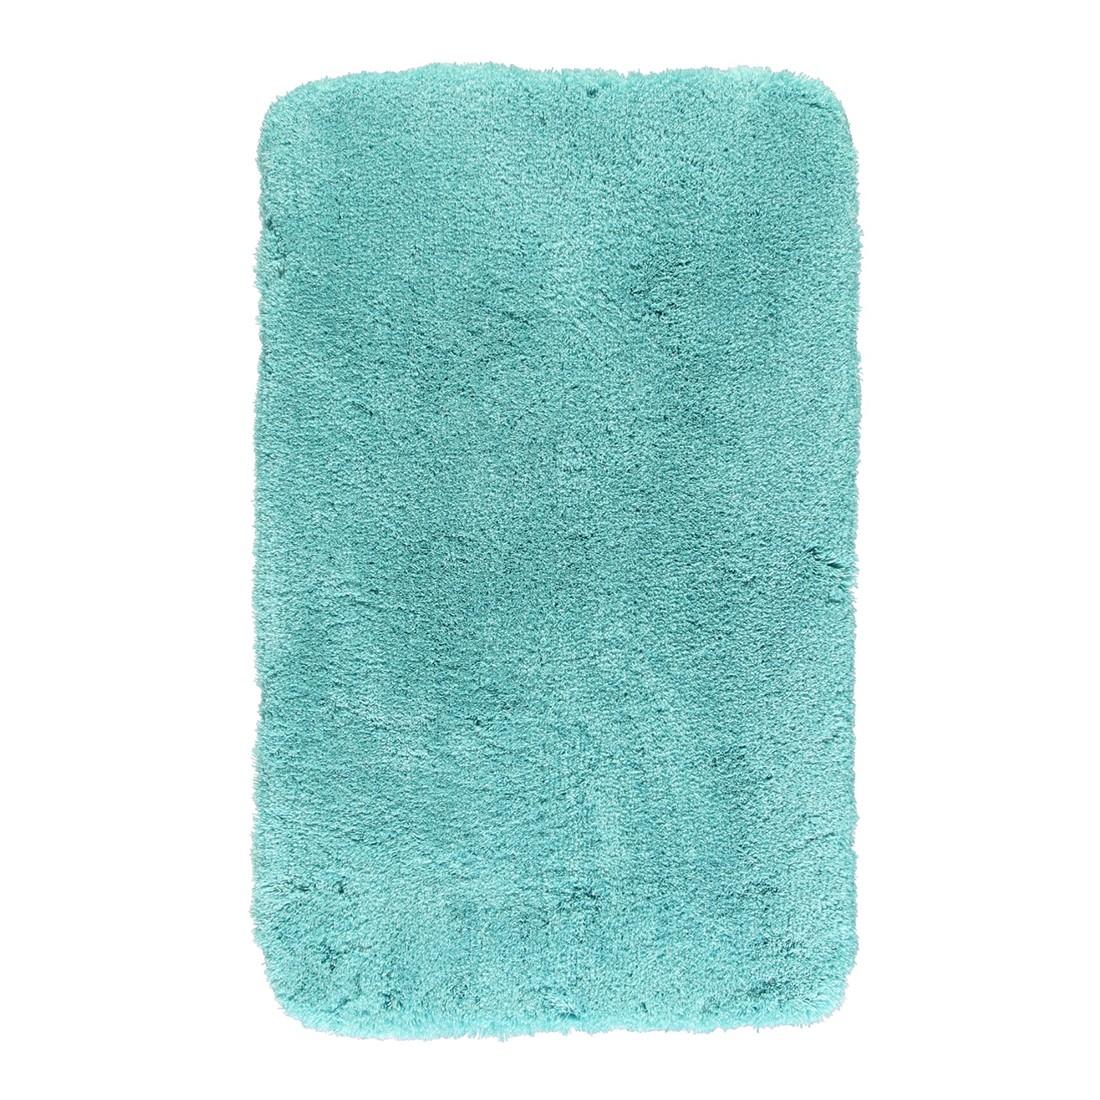 Badteppich Relax – 100% Polyacryl Türkis – 672 – 50 x 80 cm, Kleine Wolke jetzt kaufen